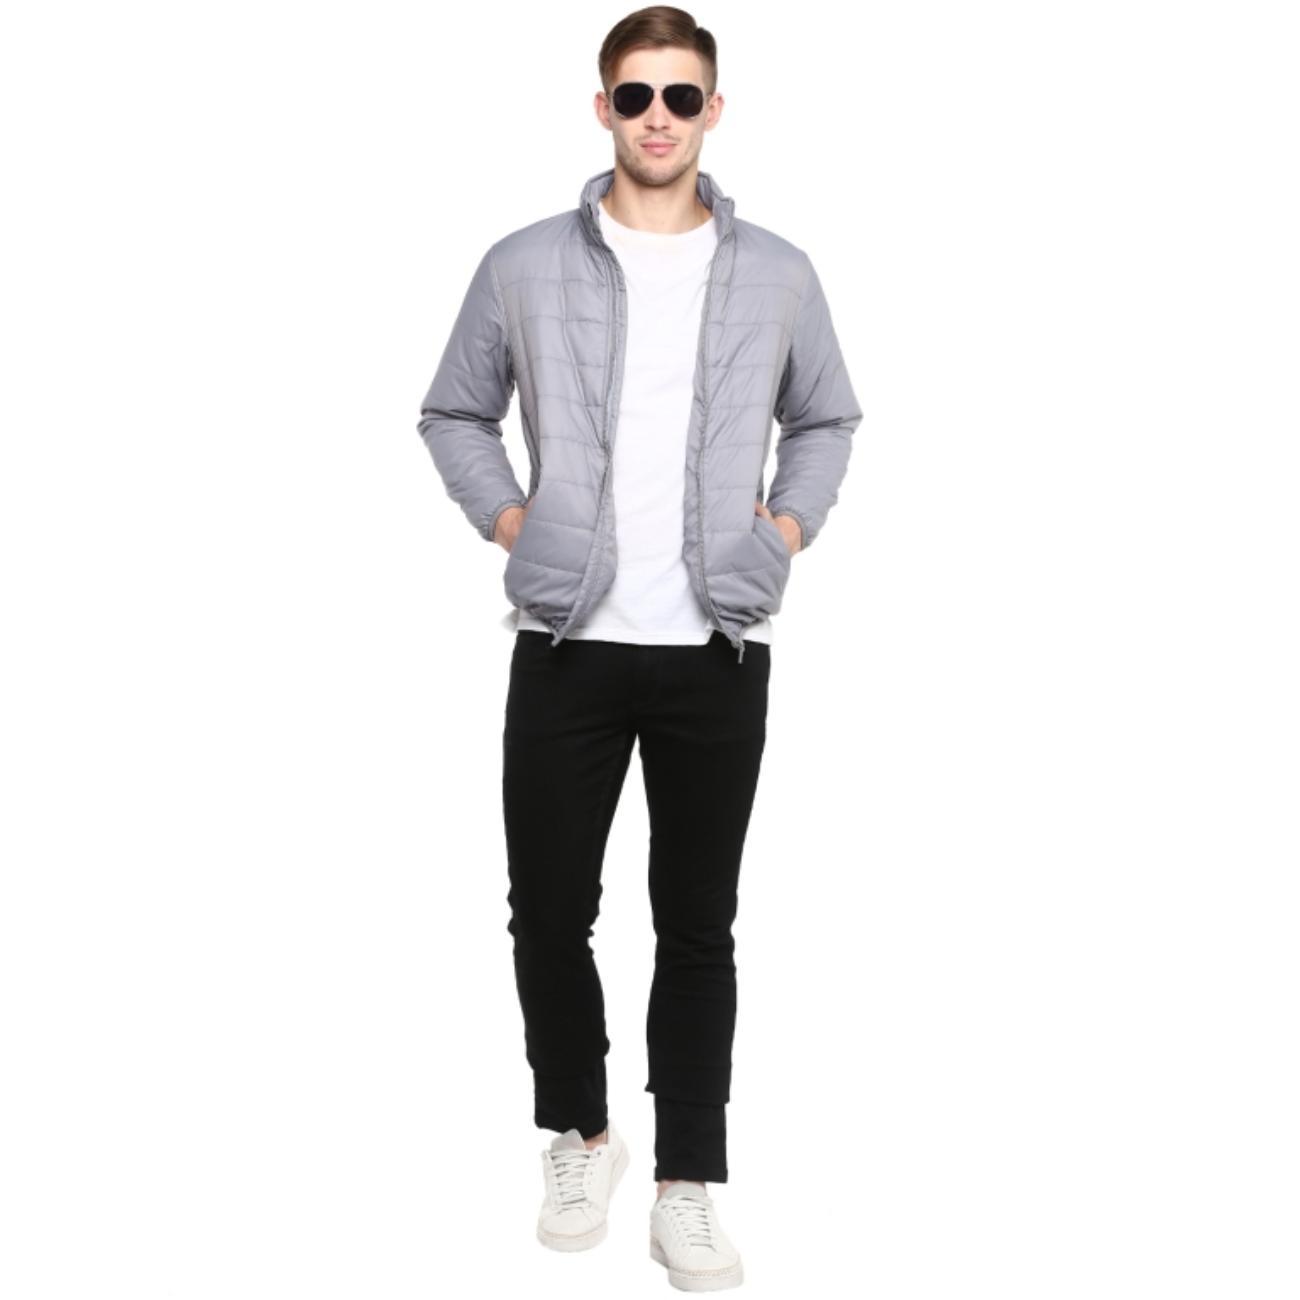 Buy Men's Light Gray Jacket